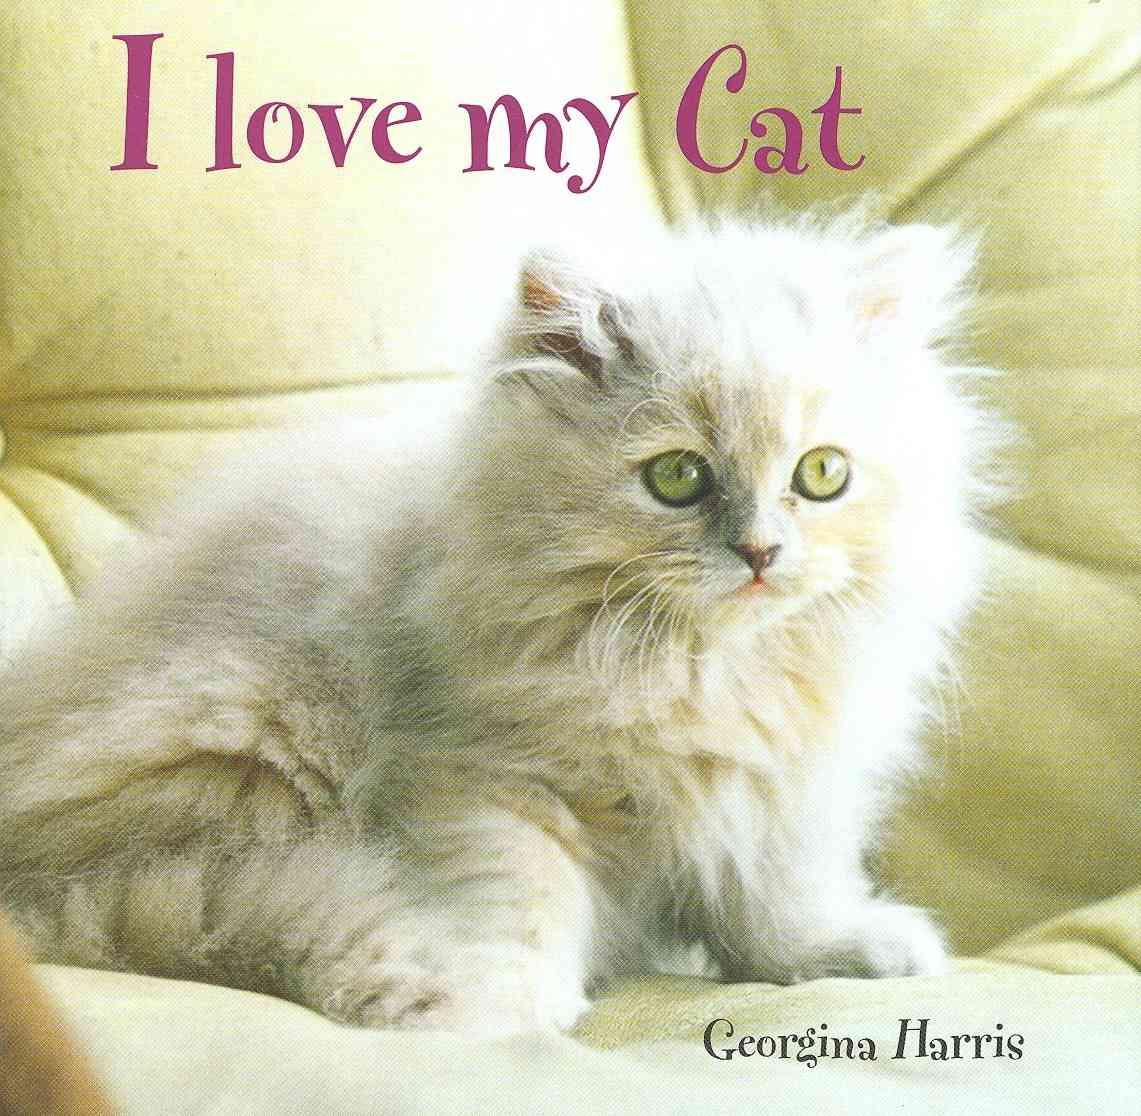 I Love My Cat (Hardcover)